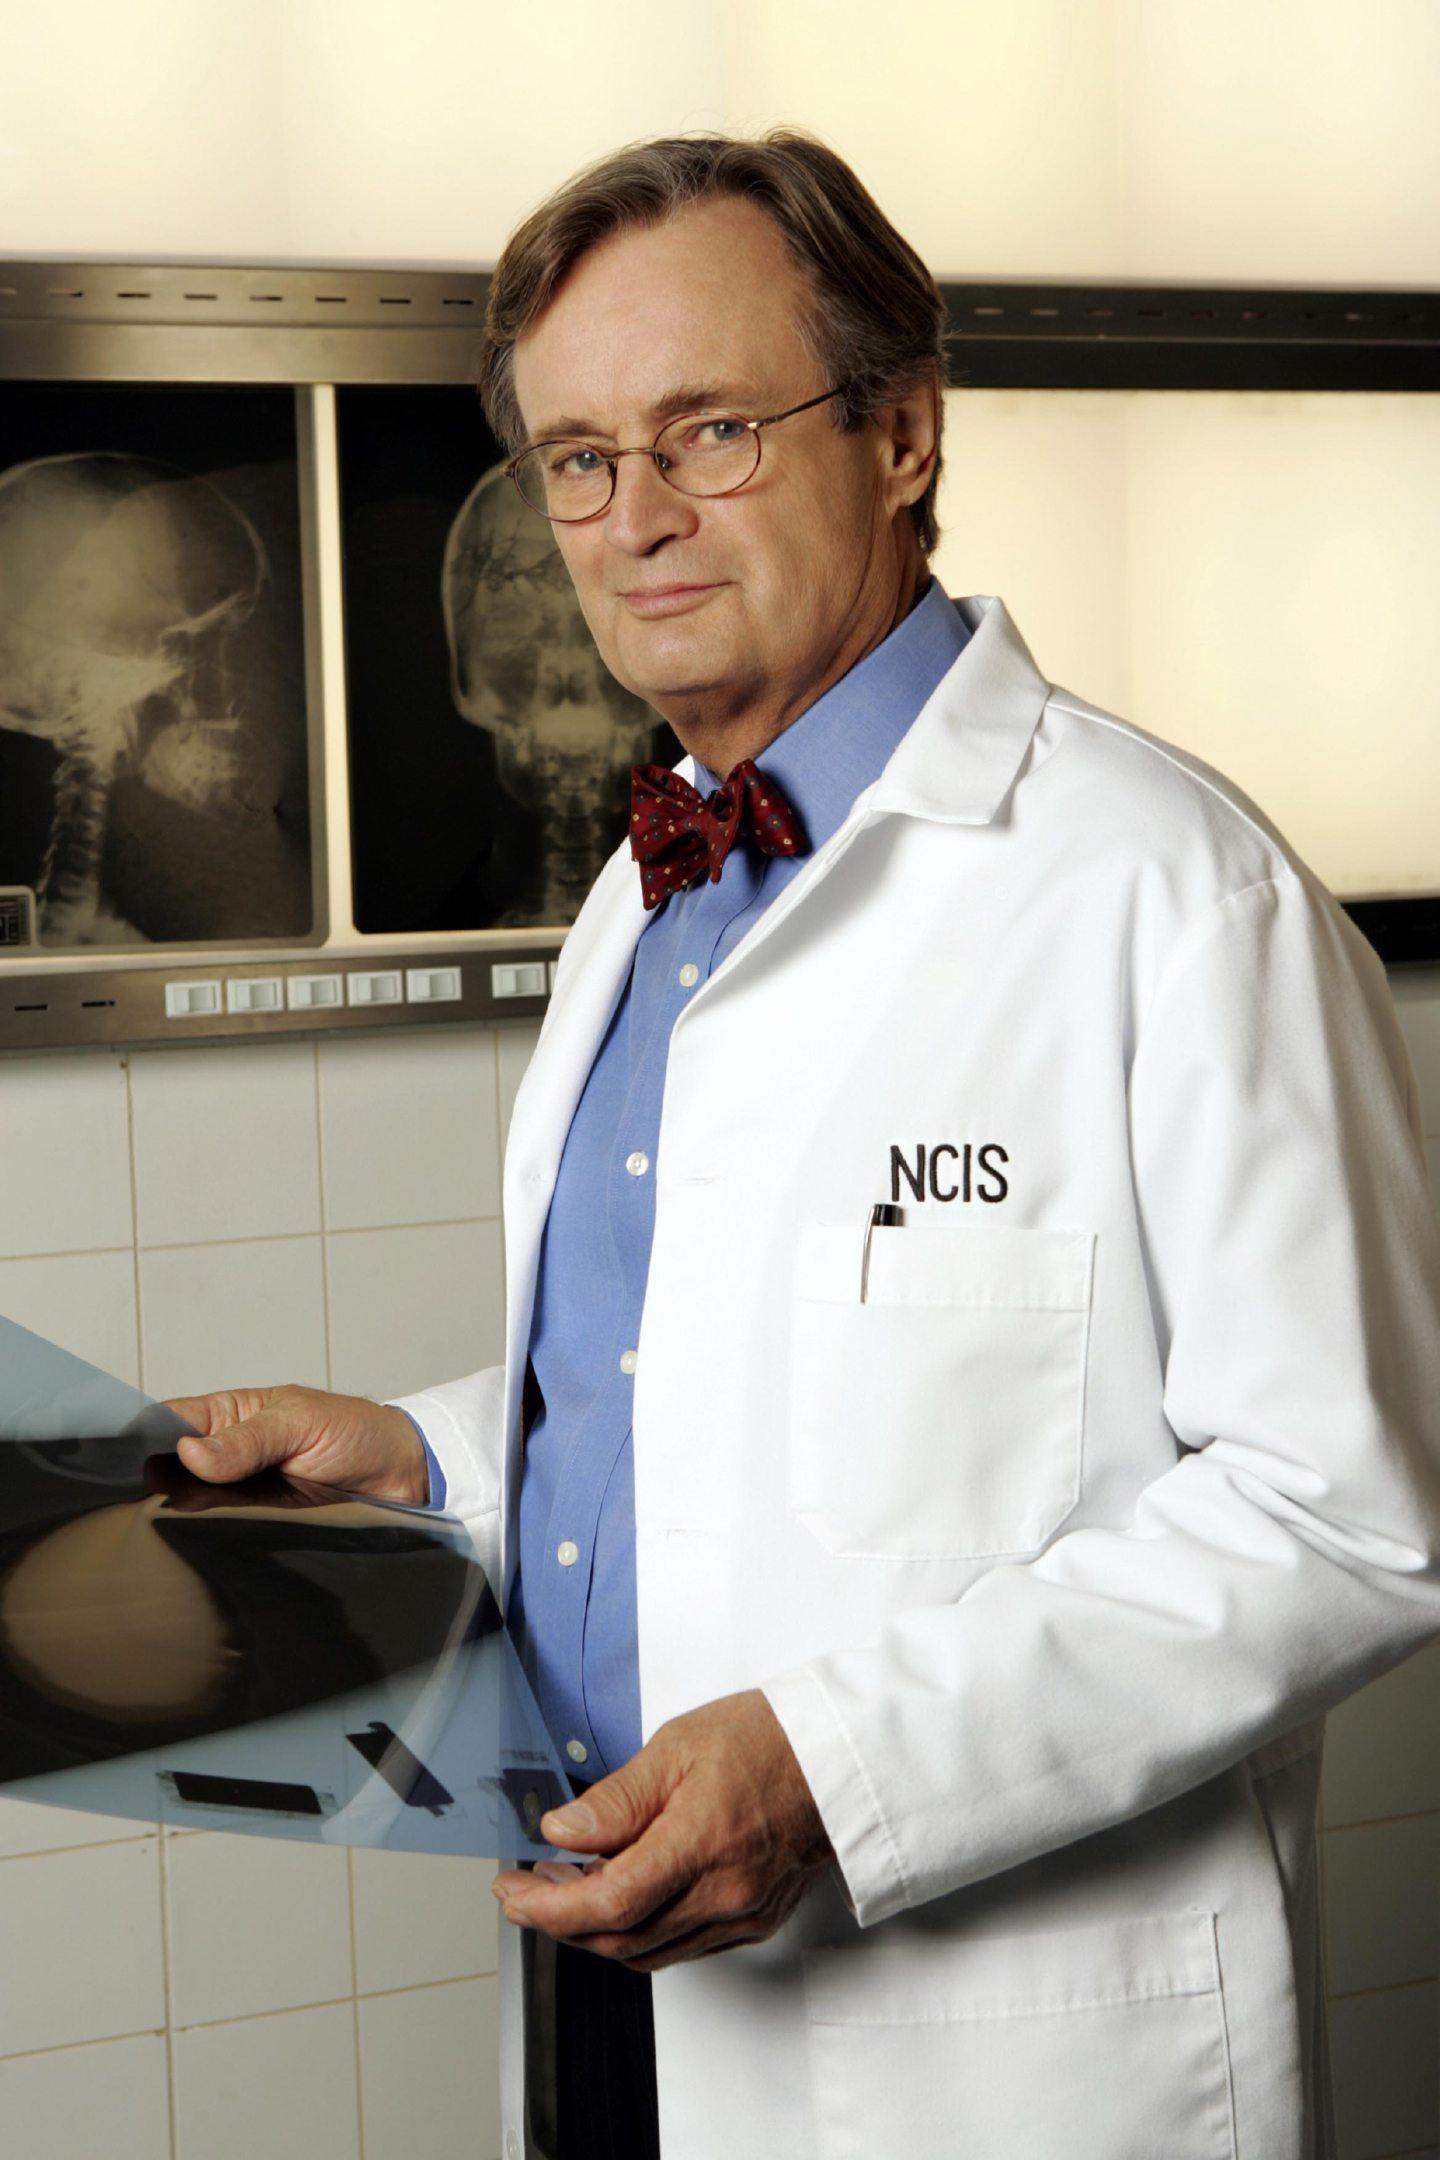 David McCallum as Dr Ducky Mallard in NCIS.